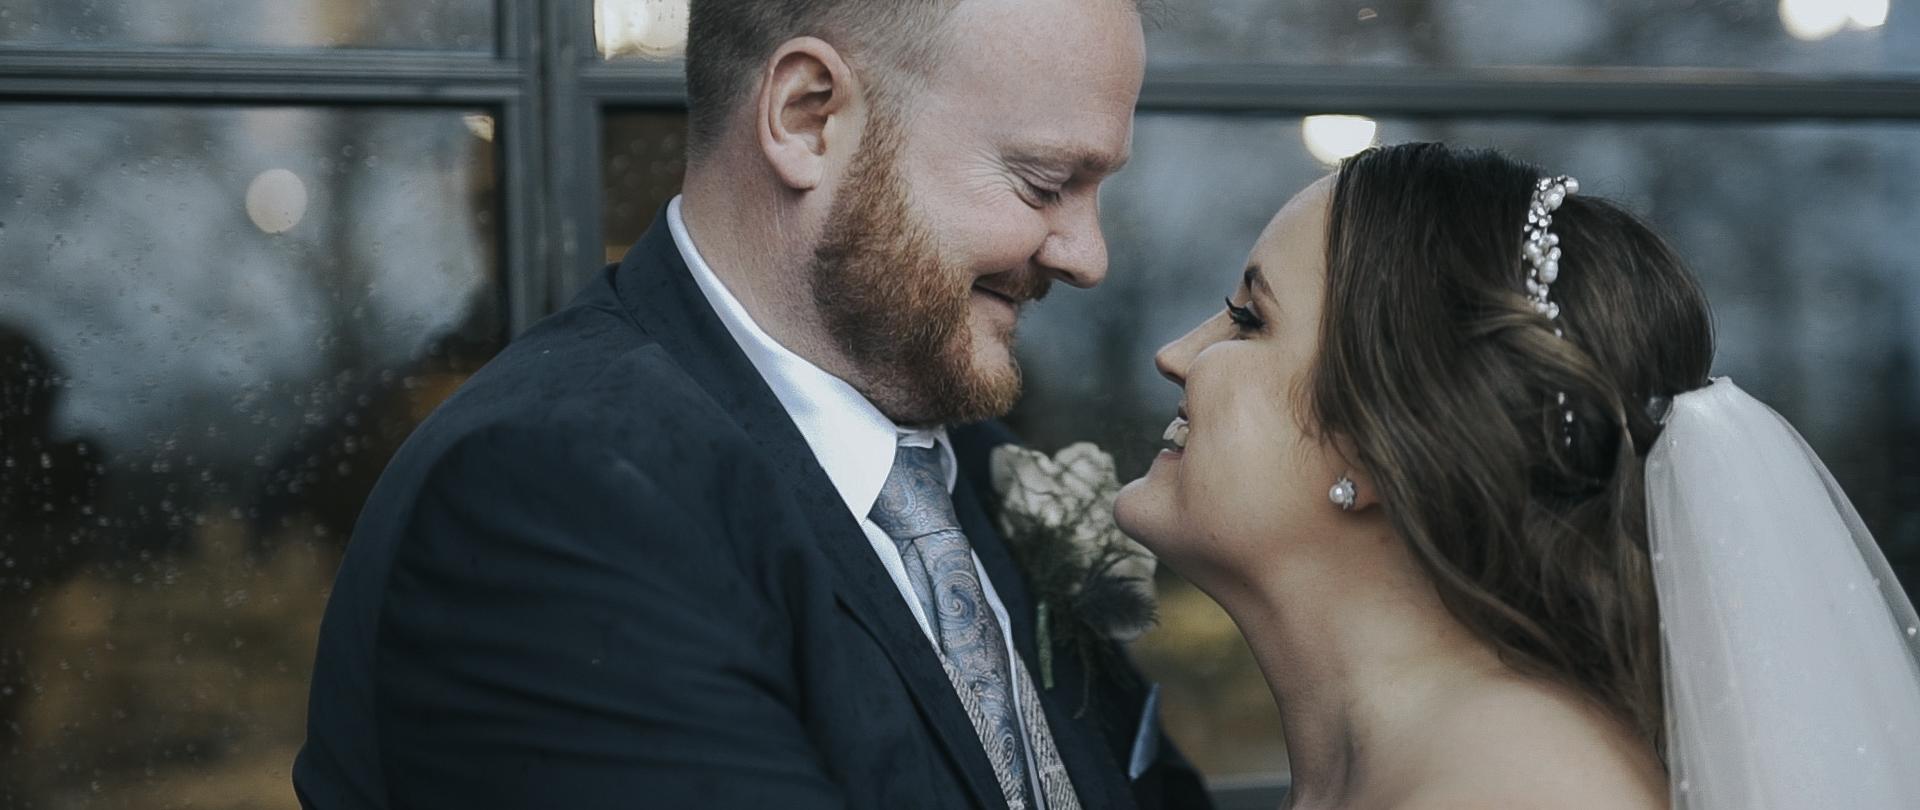 Lion Inn Boreham Wedding Video